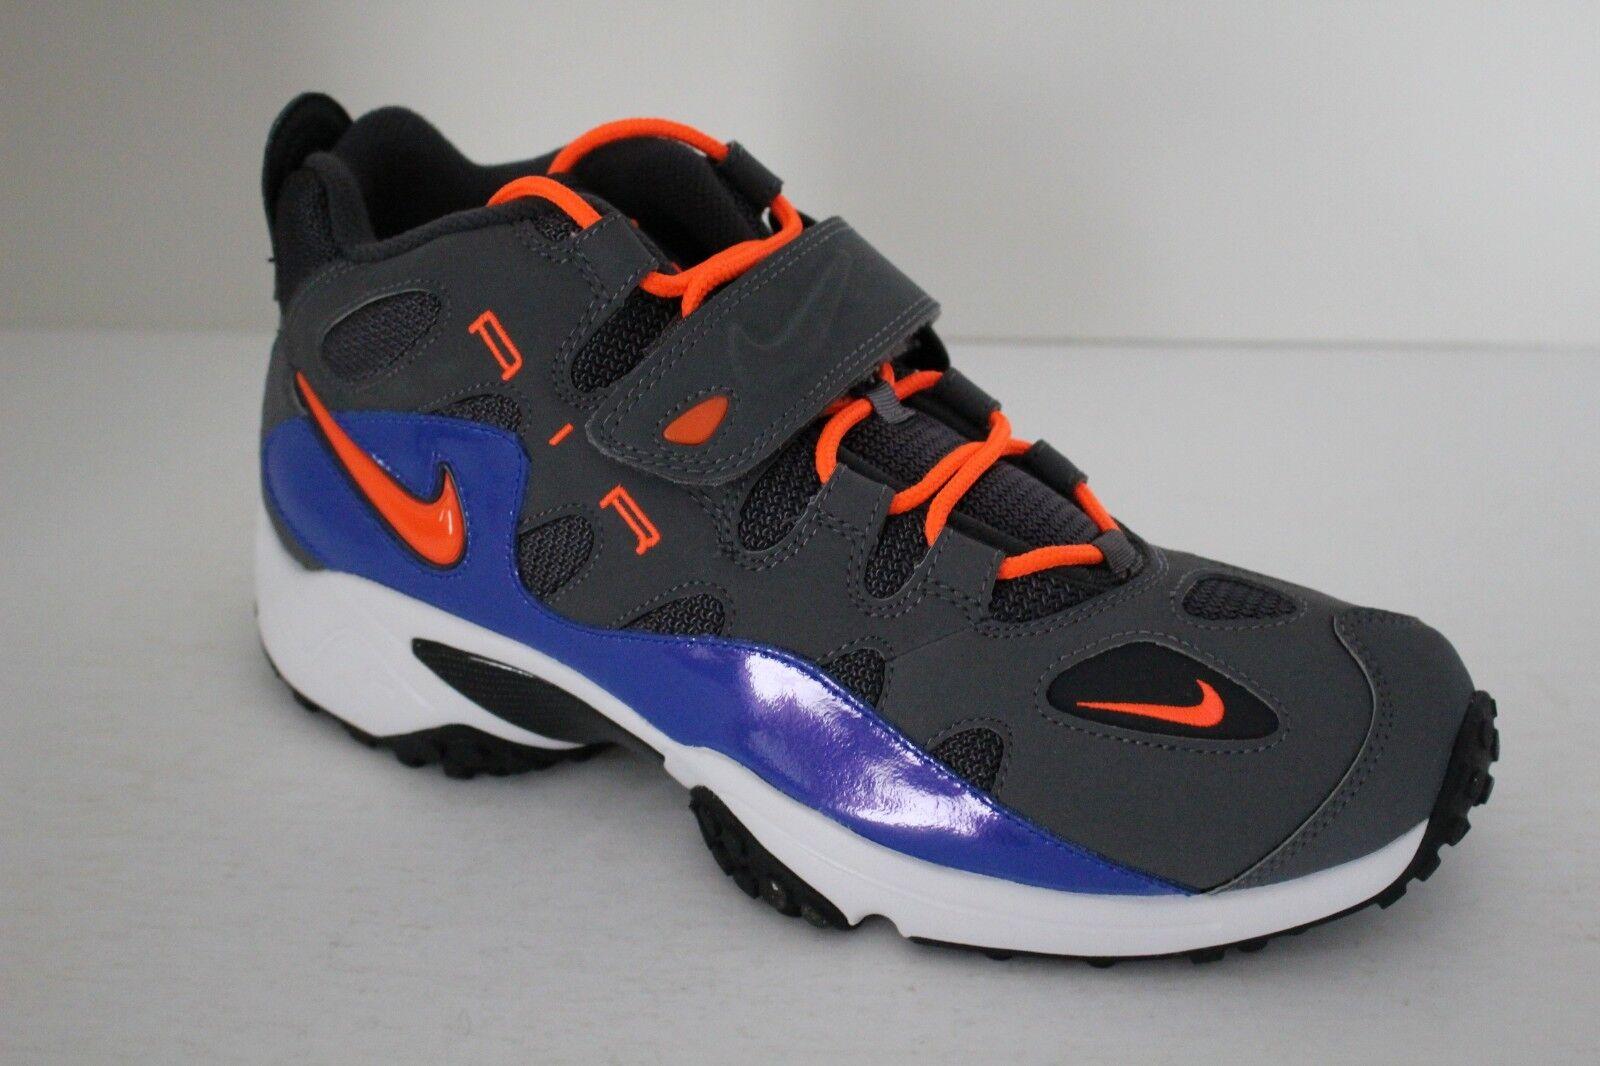 Nike Air Turf Raider Mens Basketball Trainers Anthracite Crimson Hyper bluee Blk